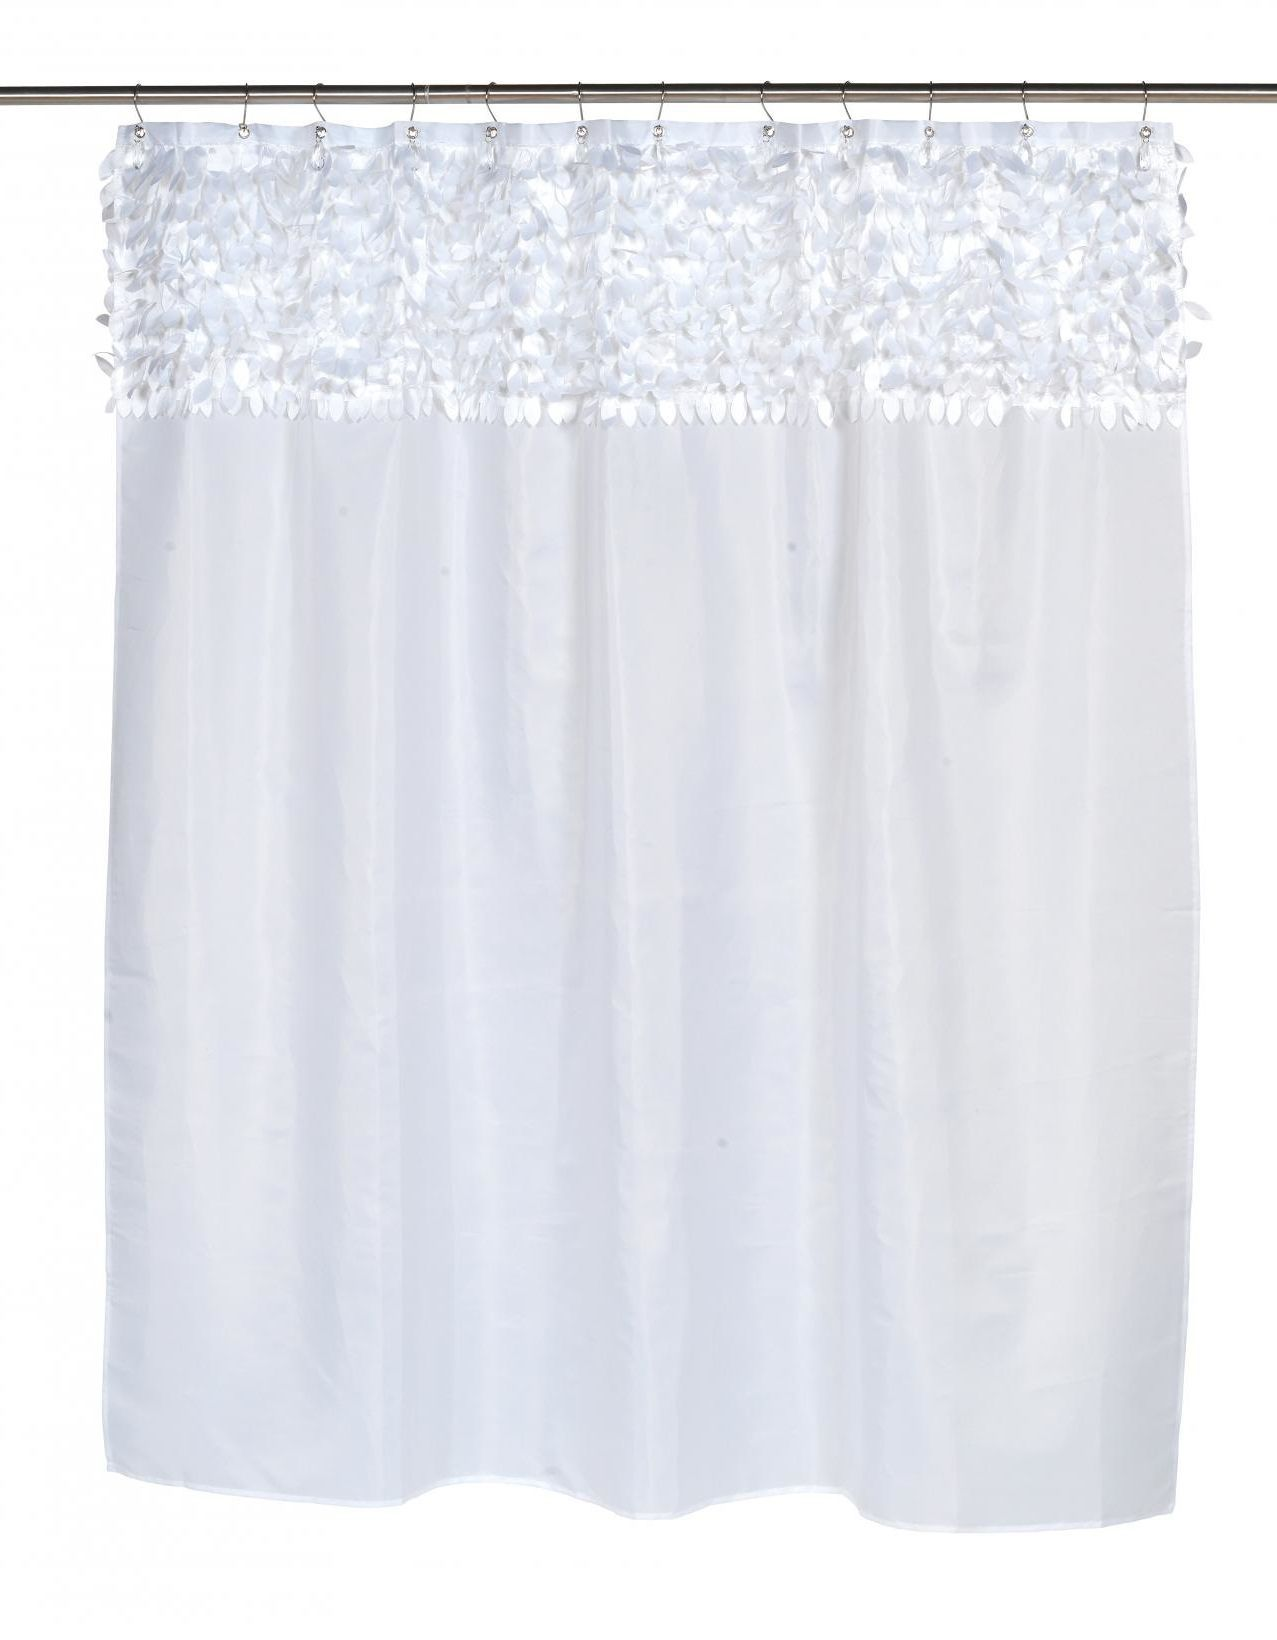 Шторки Шторка для ванной 178x183 Carnation Home Fashions Jasmine White elitnaya-shtorka-dlya-vannoy-jasmine-white-ot-carnation-home-fashions-ssha-kitay.jpg